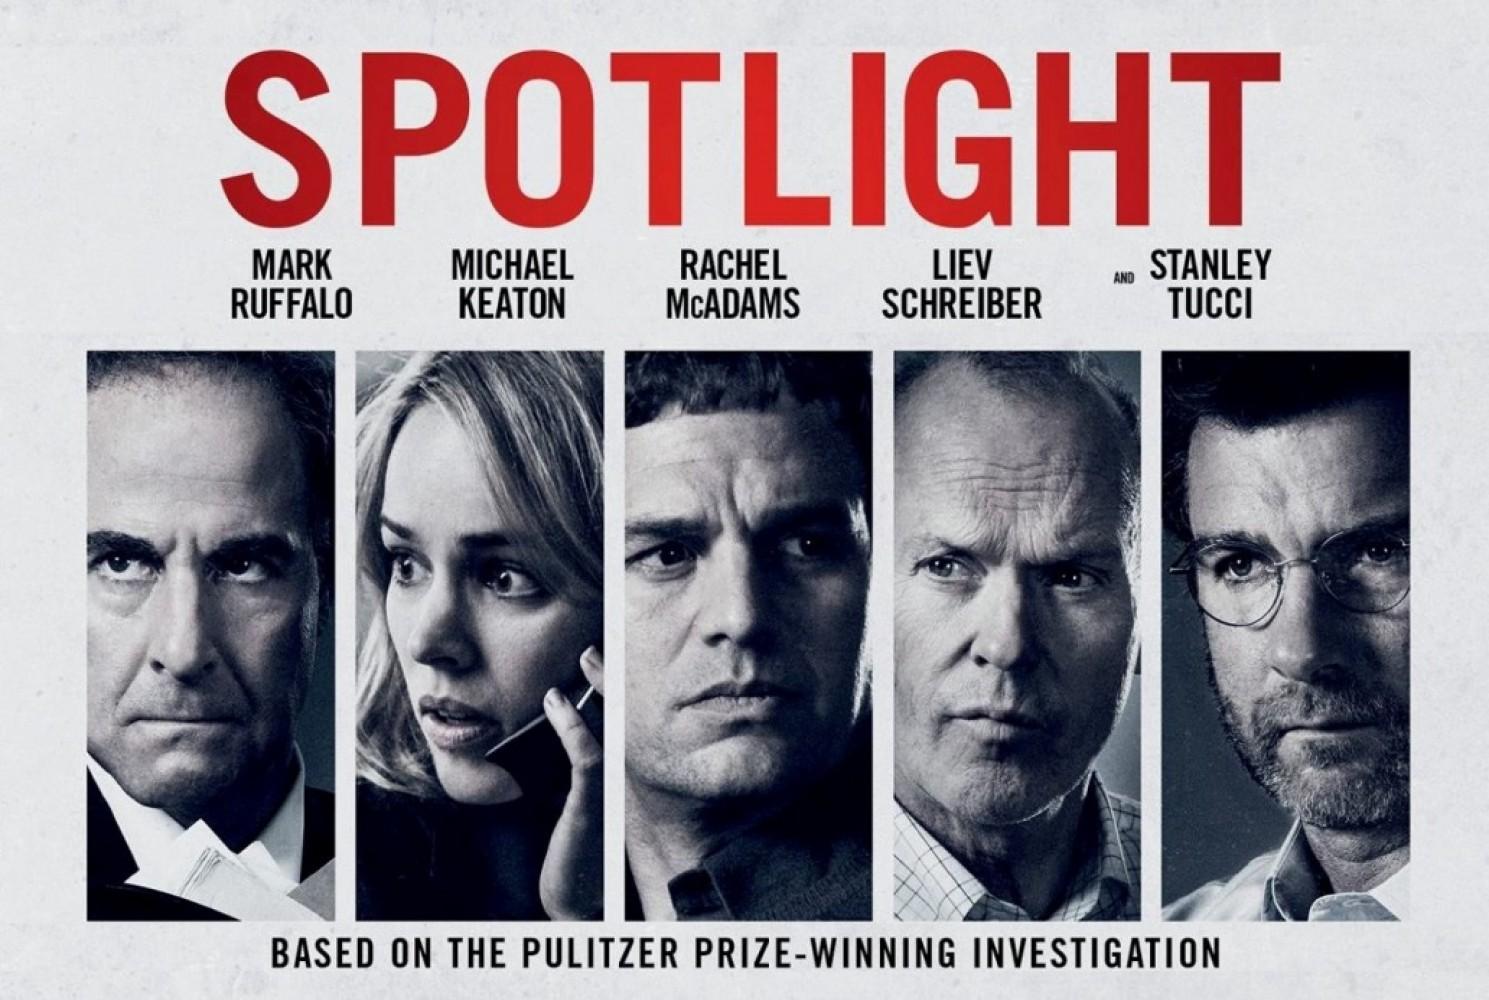 Spotlight: Movie Review